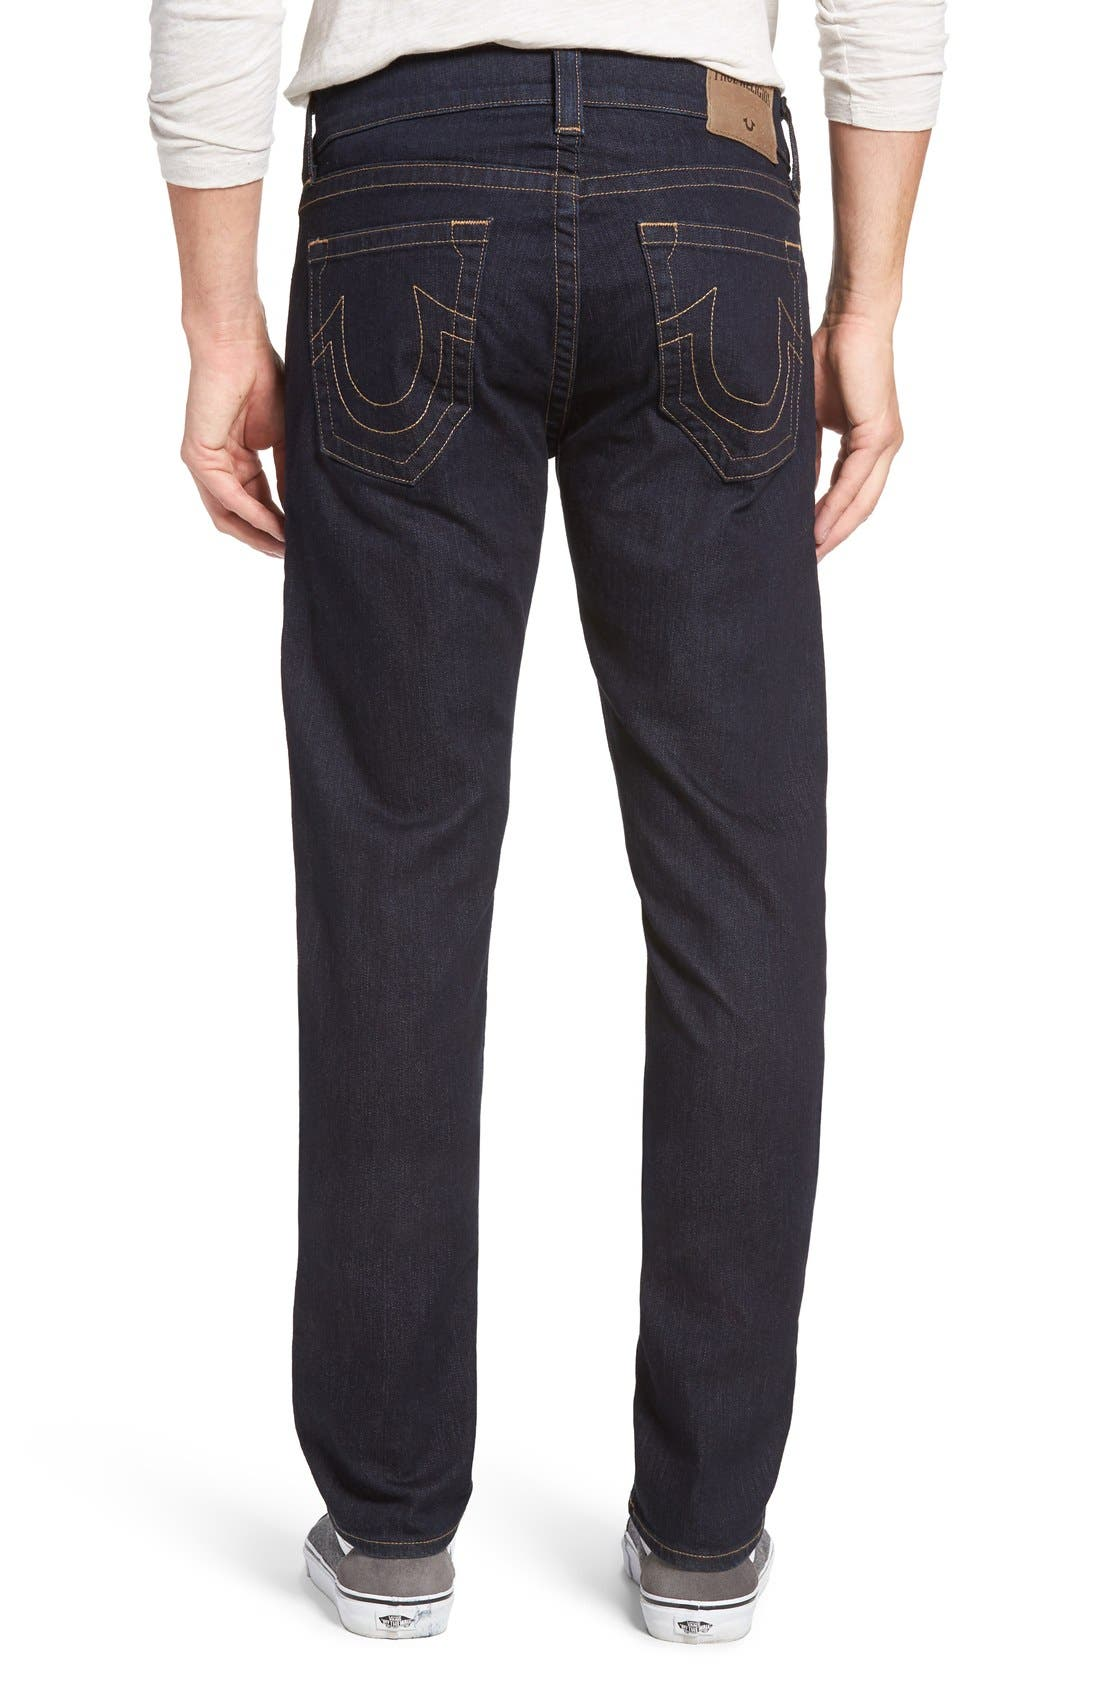 Geno Straight Leg Jeans,                             Alternate thumbnail 2, color,                             2S Body Rinse